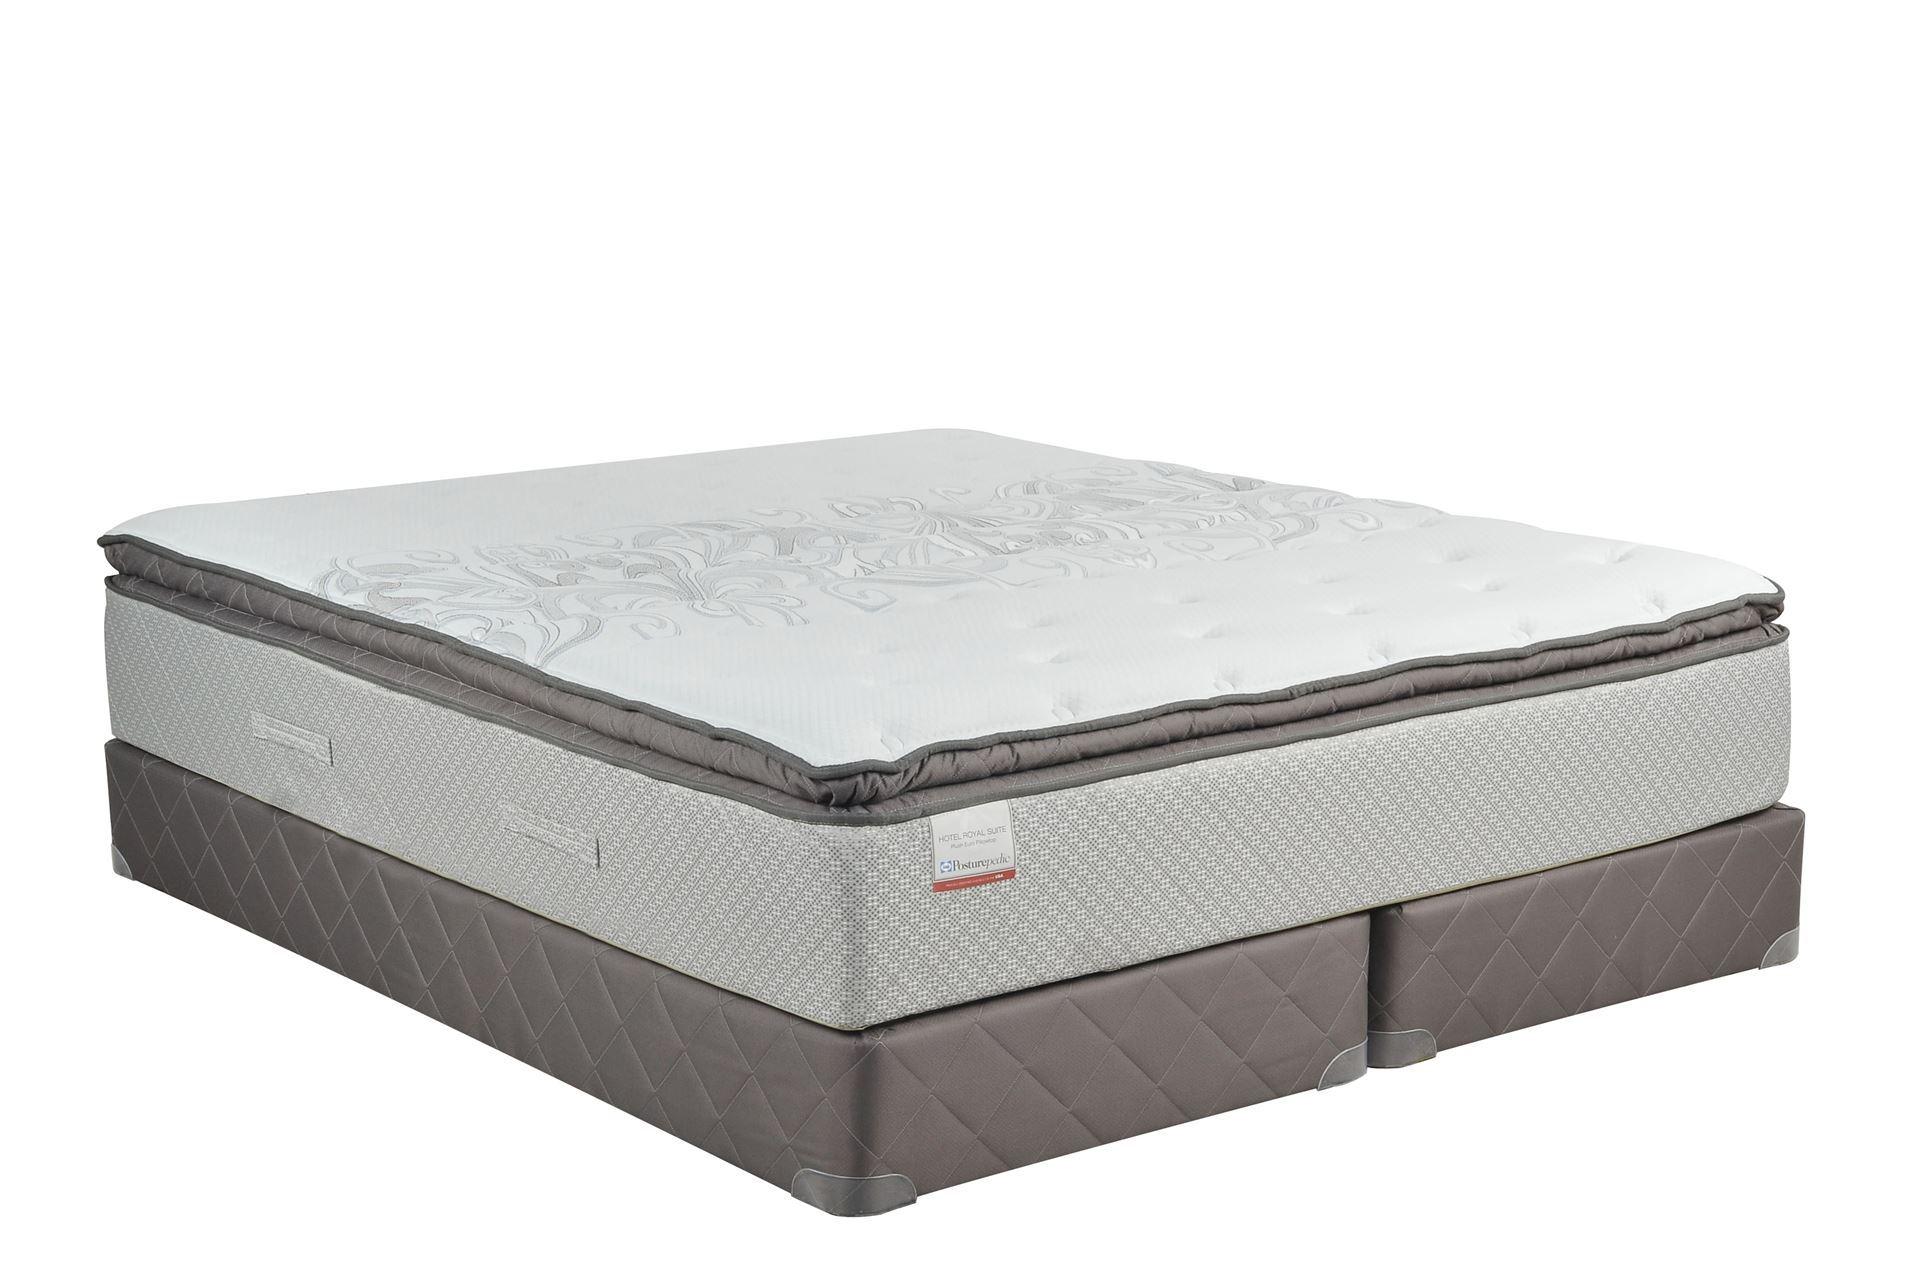 Royal pedic full size pillowtop mattress w box spring California king box spring